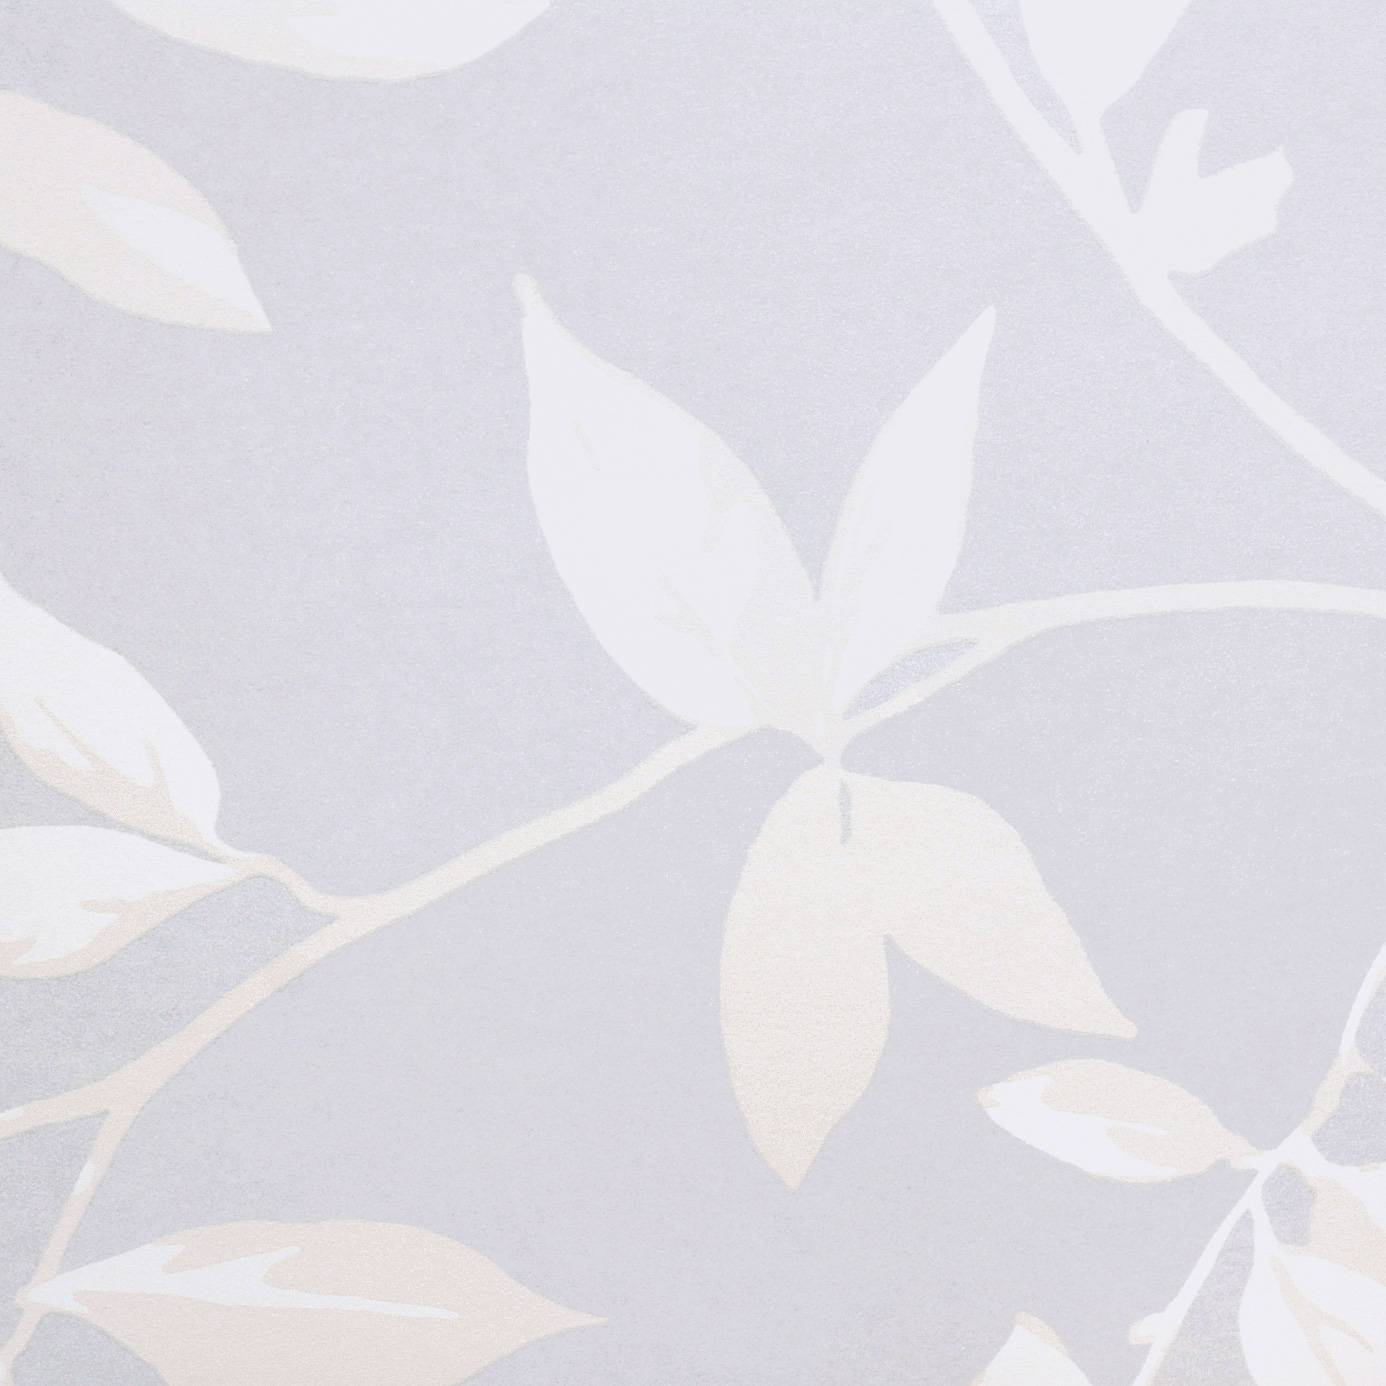 Французские обои Casadeco,  коллекция So White 2, артикулSWI24990122